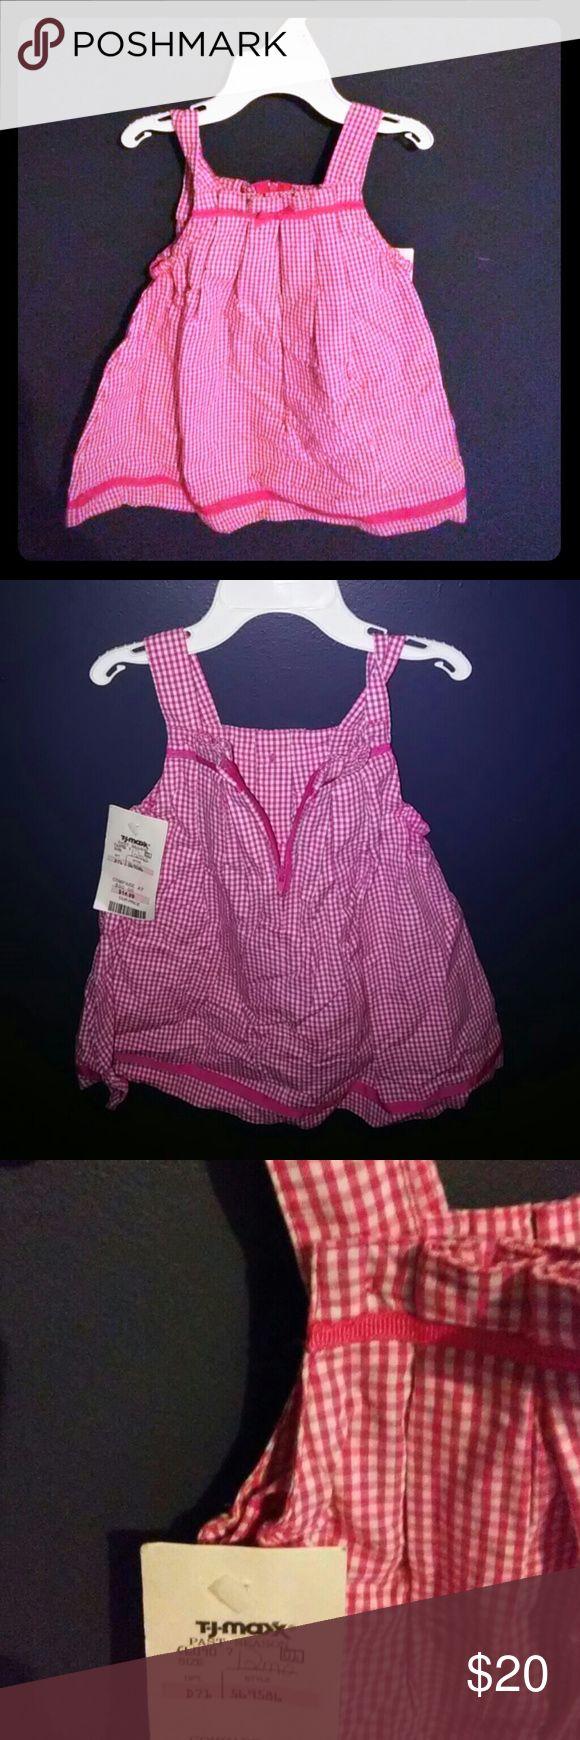 💘BOGO SALE! Liz Claiborne toddler sundress Pink and white checkered. Liz Claiborne Dresses Formal